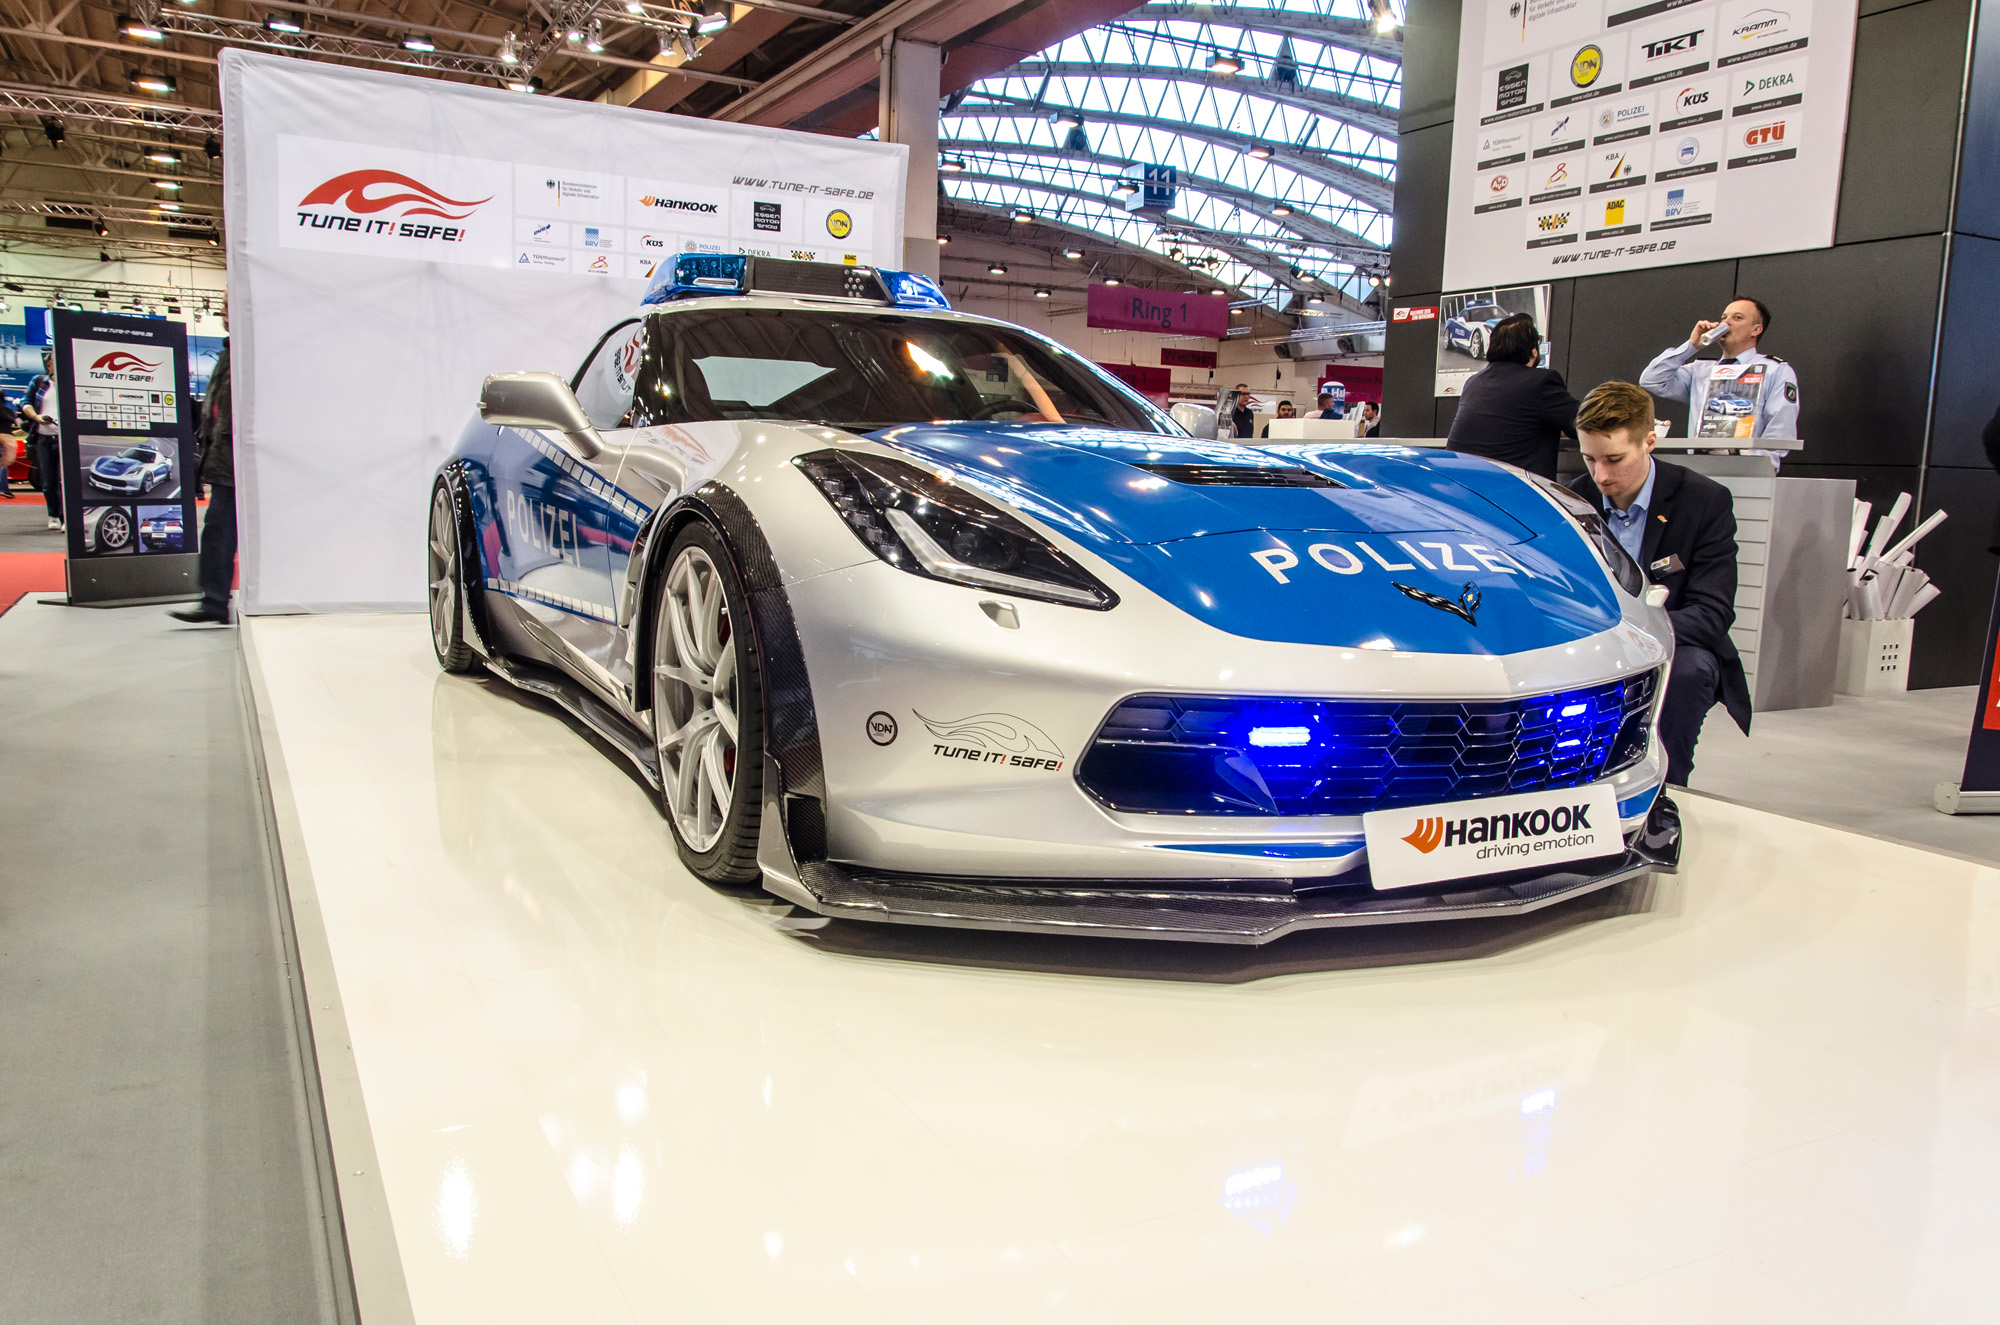 Corvette als Polizeimobil